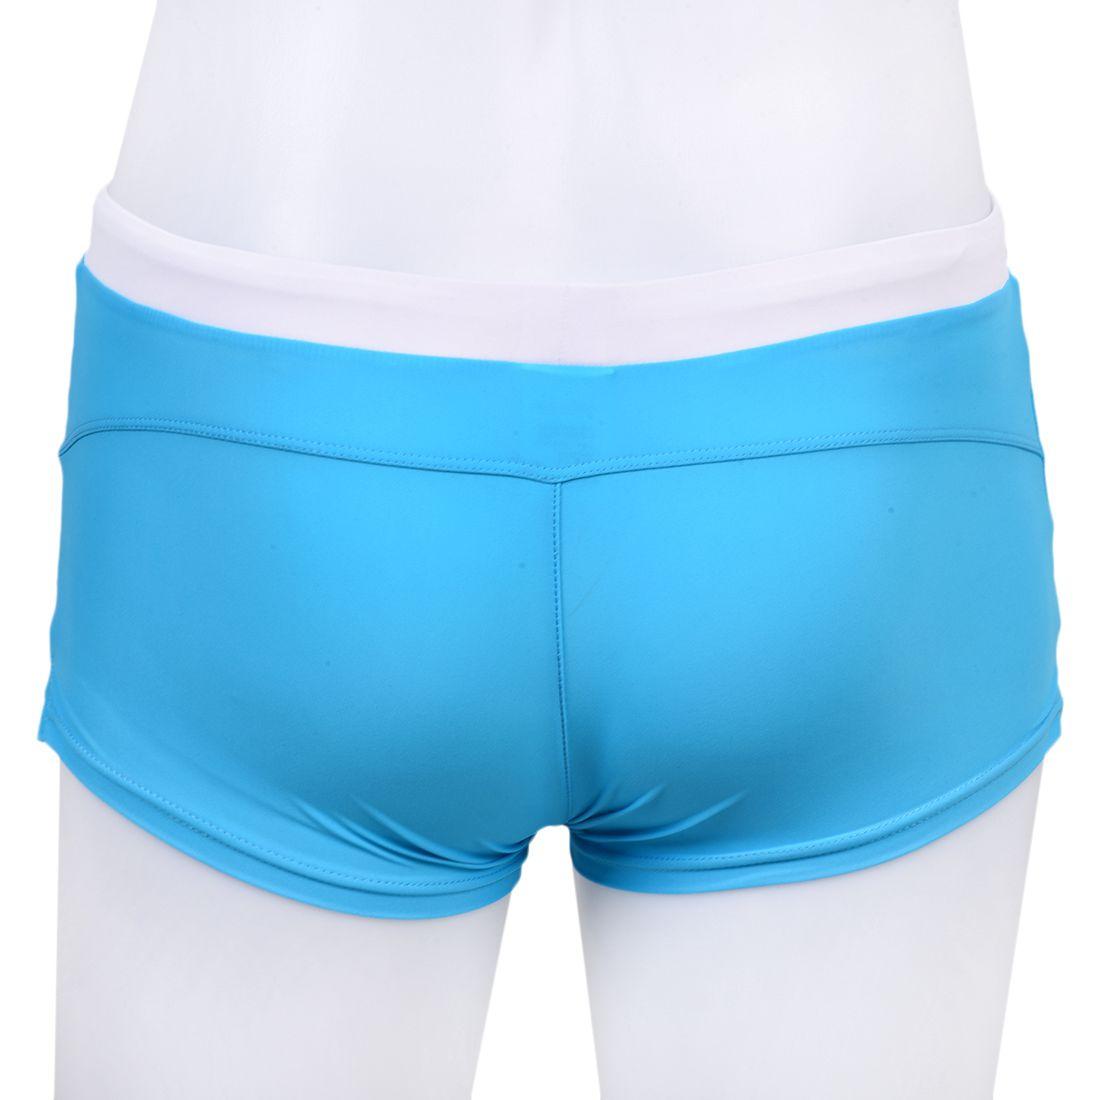 AQUX-Hot-Sexy-Men-Swimwear-Men-039-s-Swimsuits-Surf-Board-Beach-Wear-Man-Swimmi-X6M5